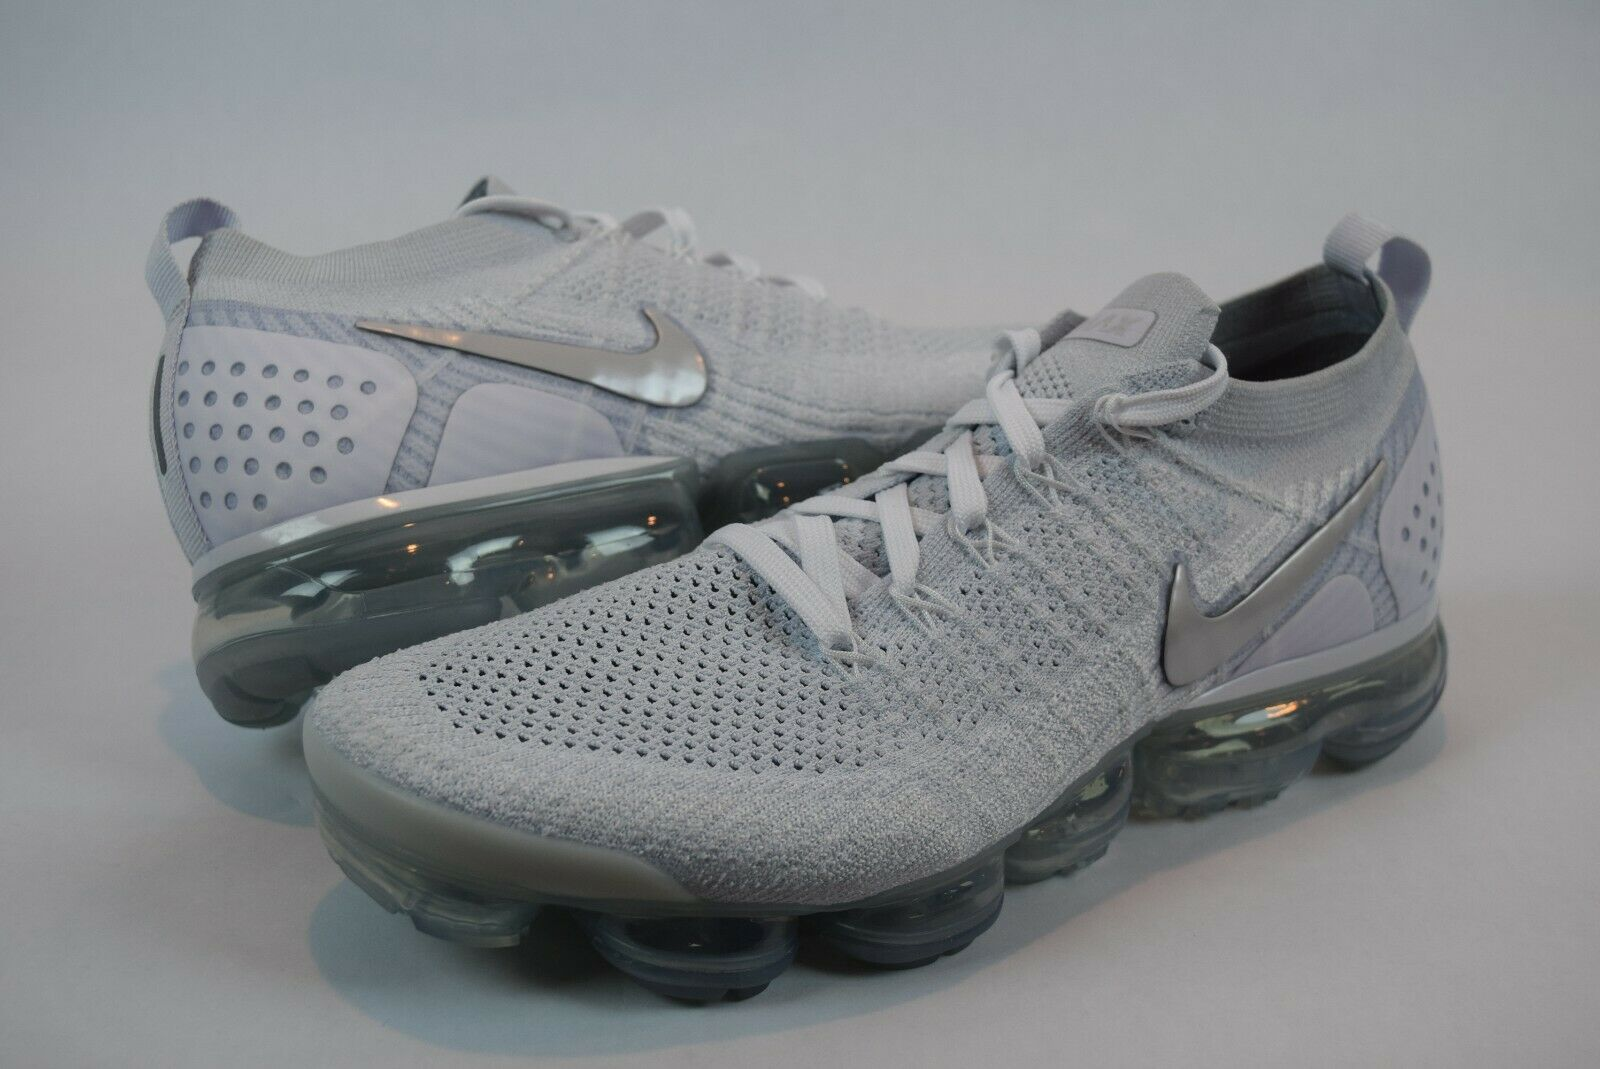 NWOB  Womens Nike Vapormax Flyknit 2 942843 105 sz 12 Mens 10.5 Vast Grey White